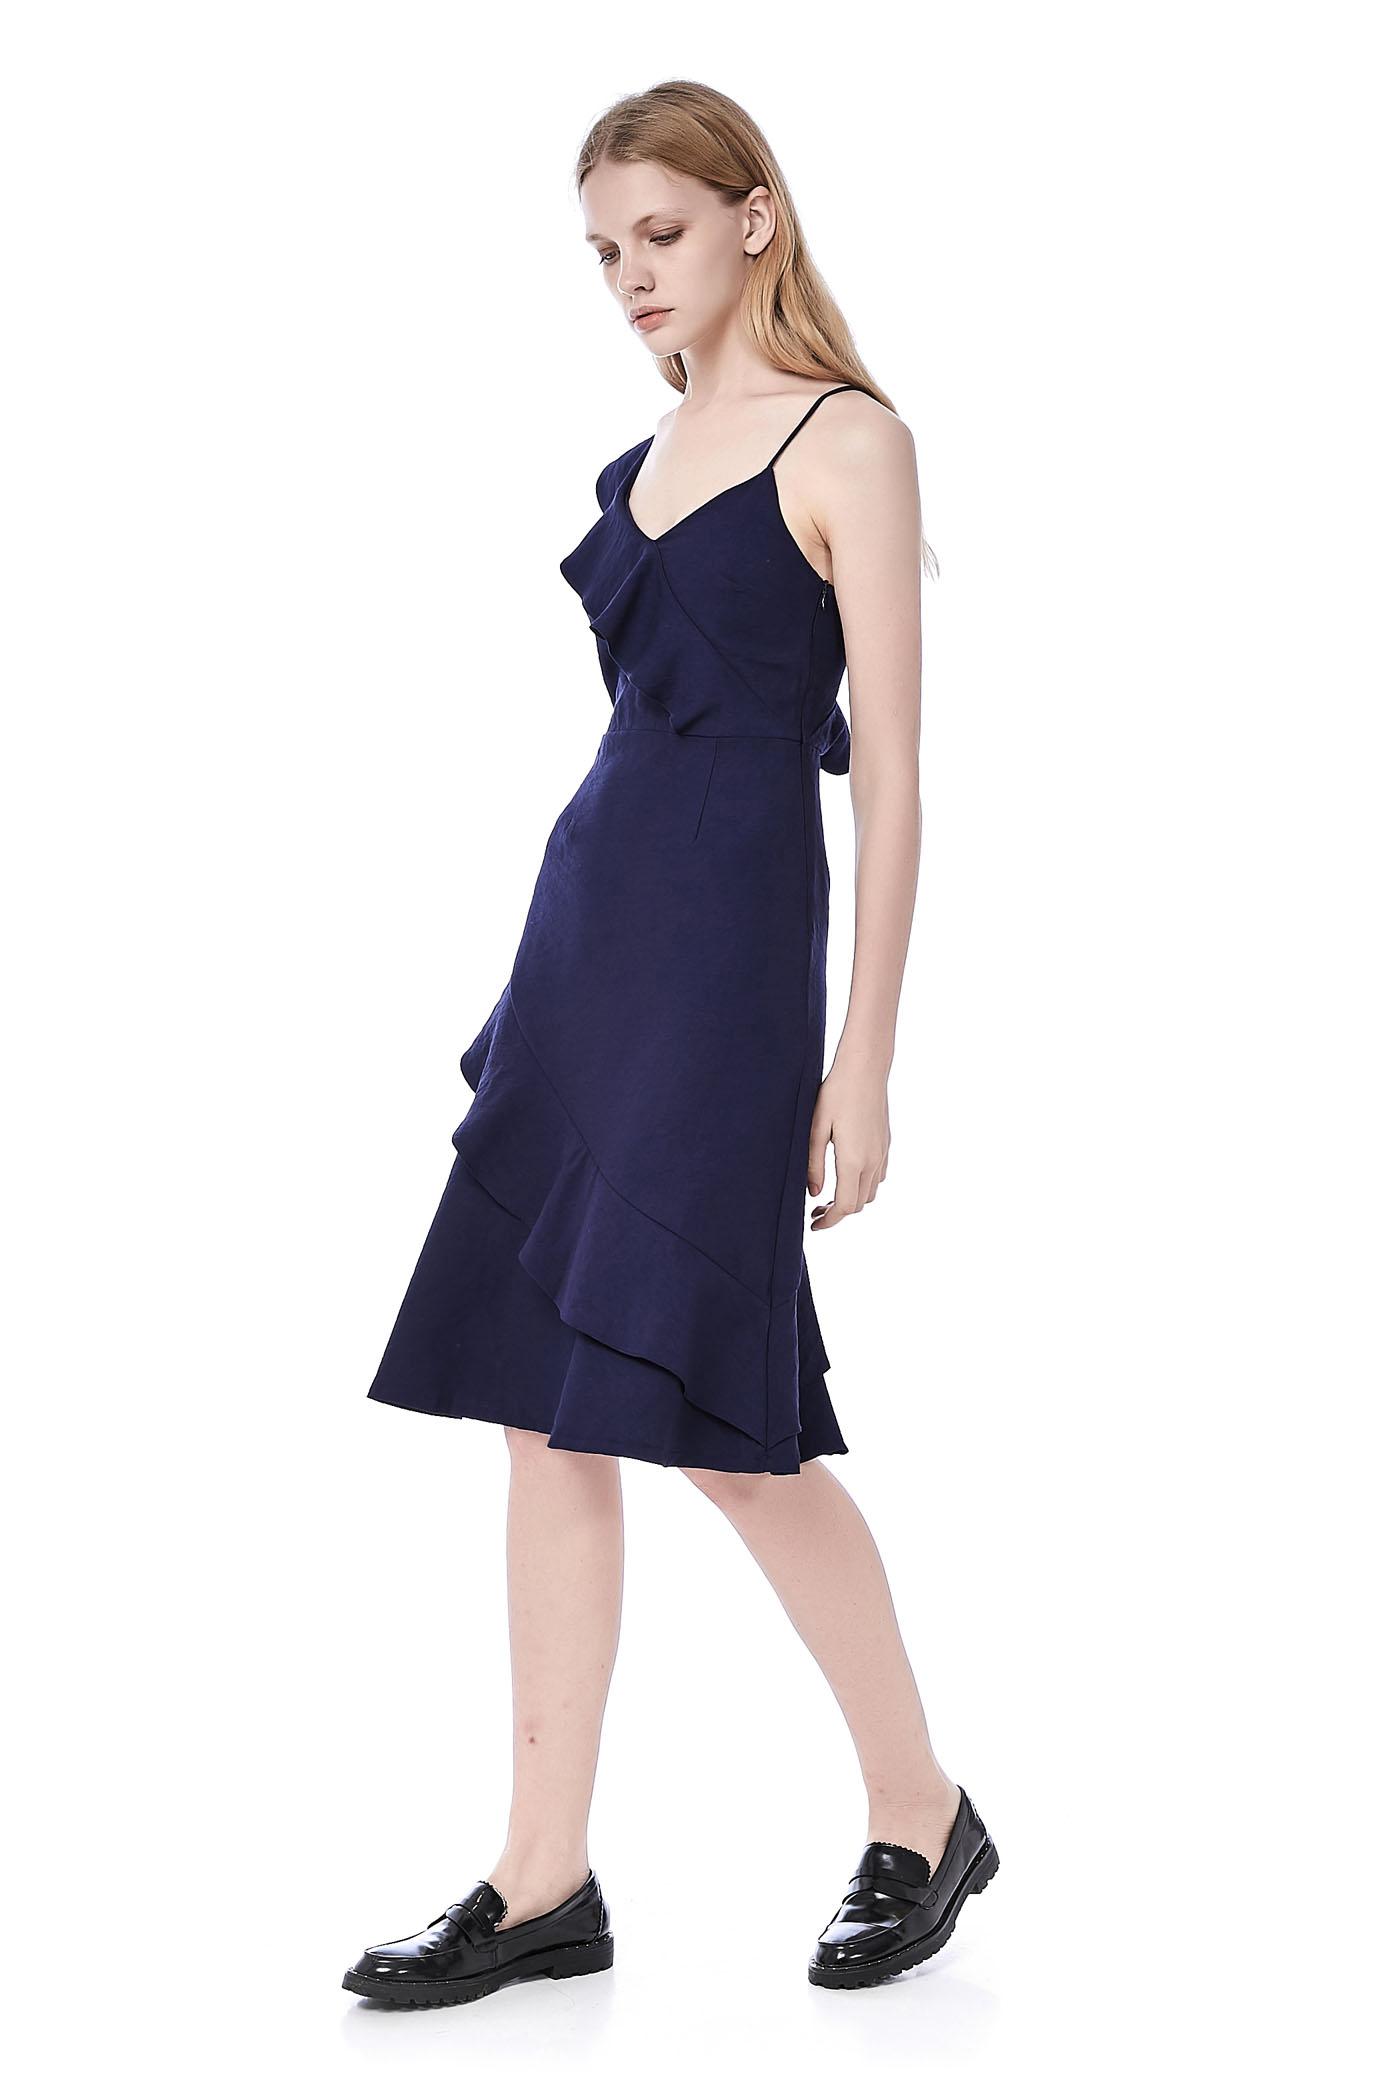 Sunny Ruffle-Trim Dress